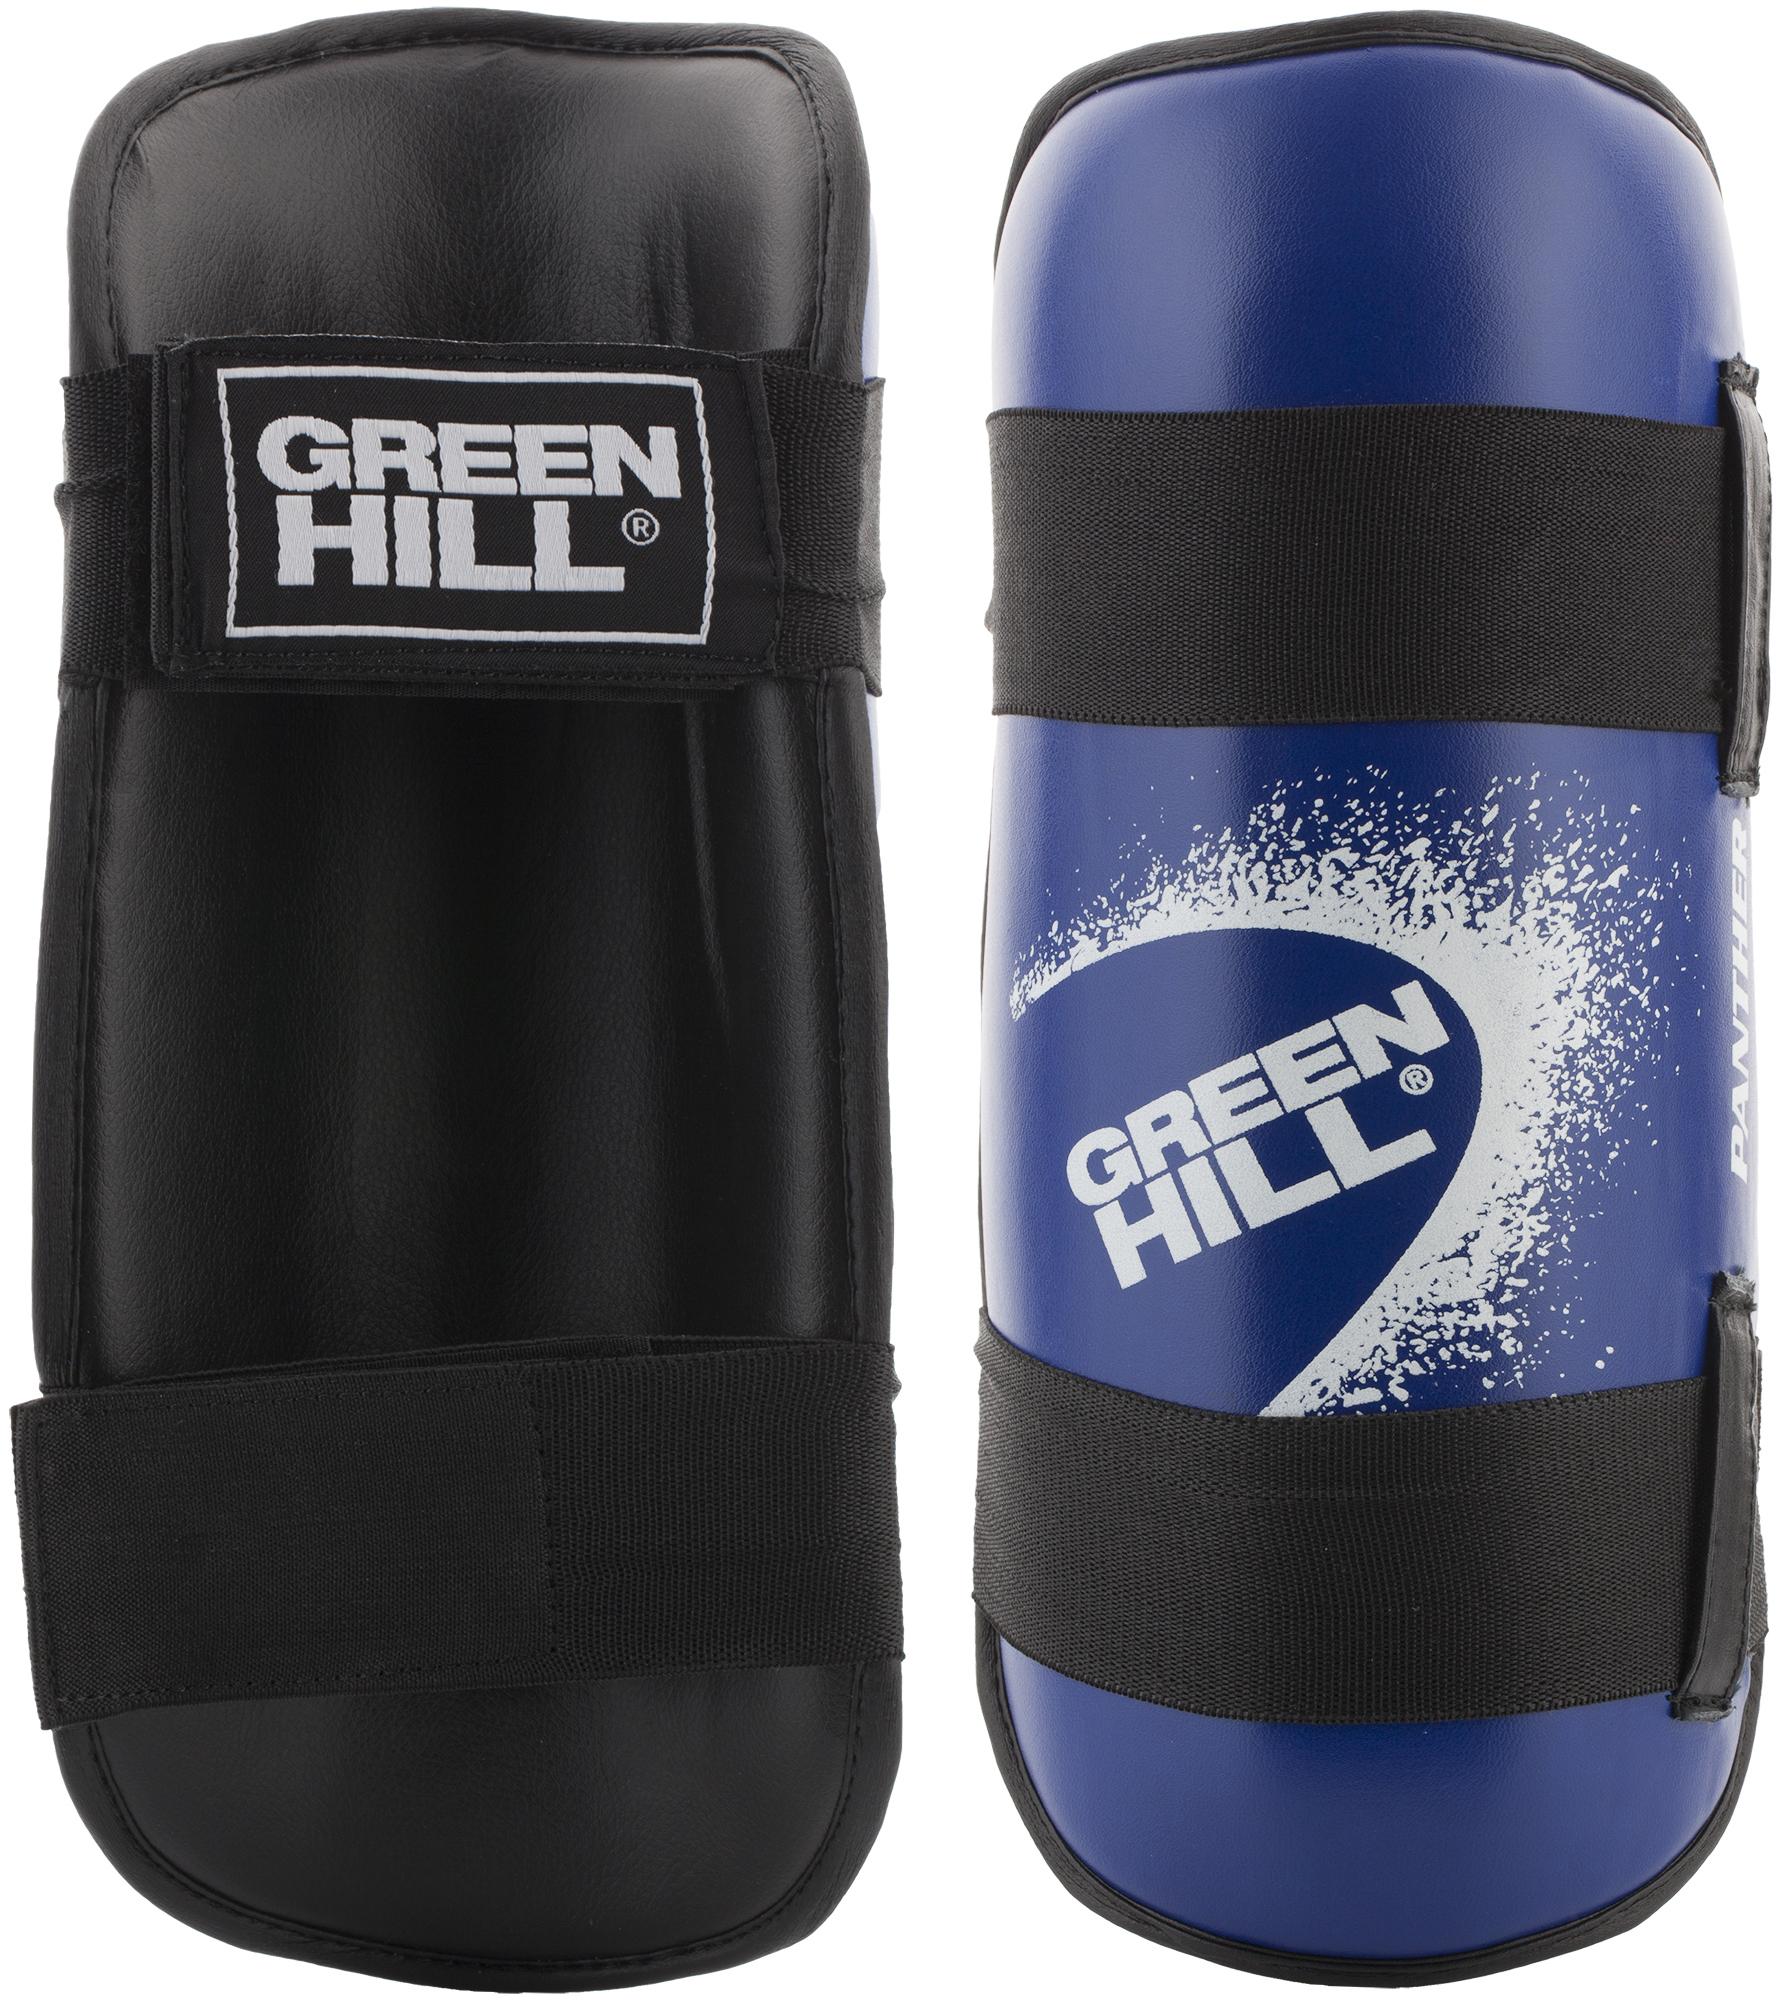 Green Hill Защита голени Green Hill Panther, размер XL защита паха мужская green hill gens csg 6048 белая